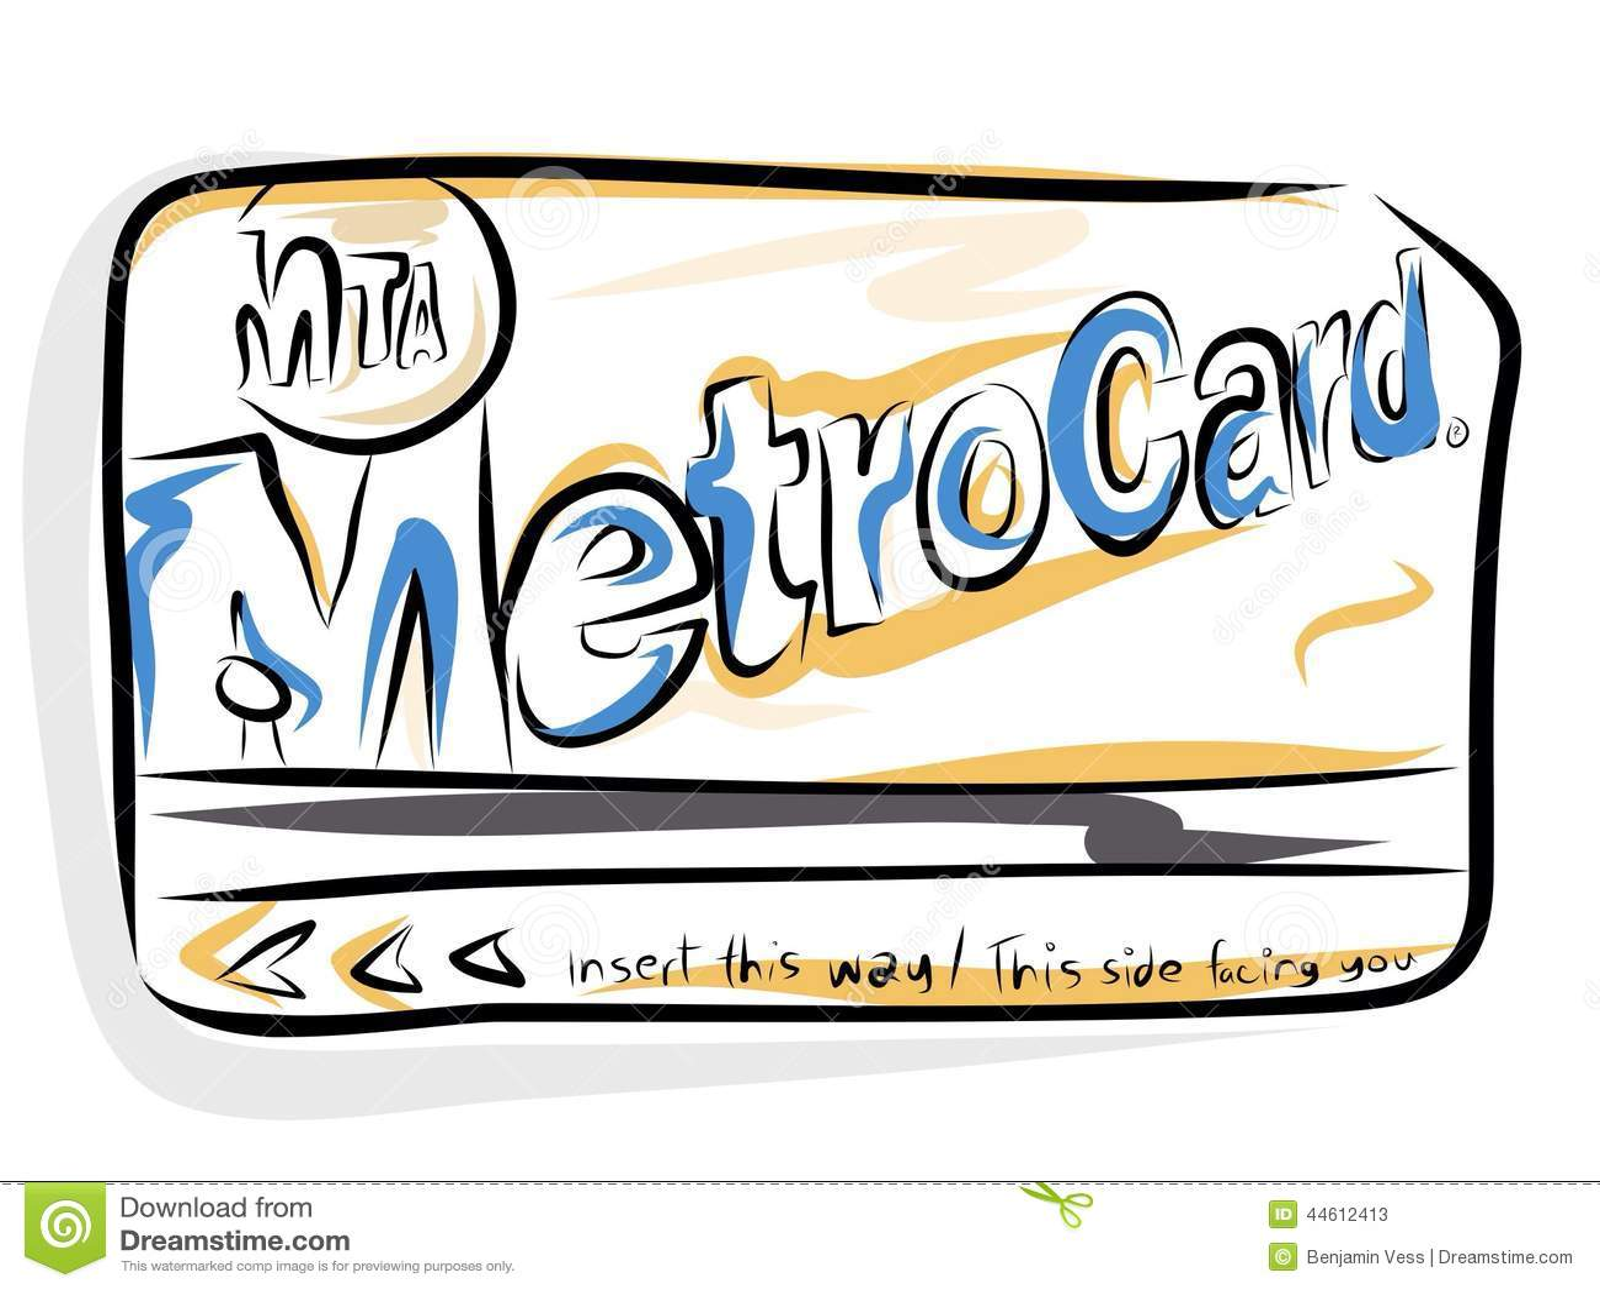 metrocard stock illustrations – 2 metrocard stock illustrations, vectors &  clipart - dreamstime  dreamstime.com